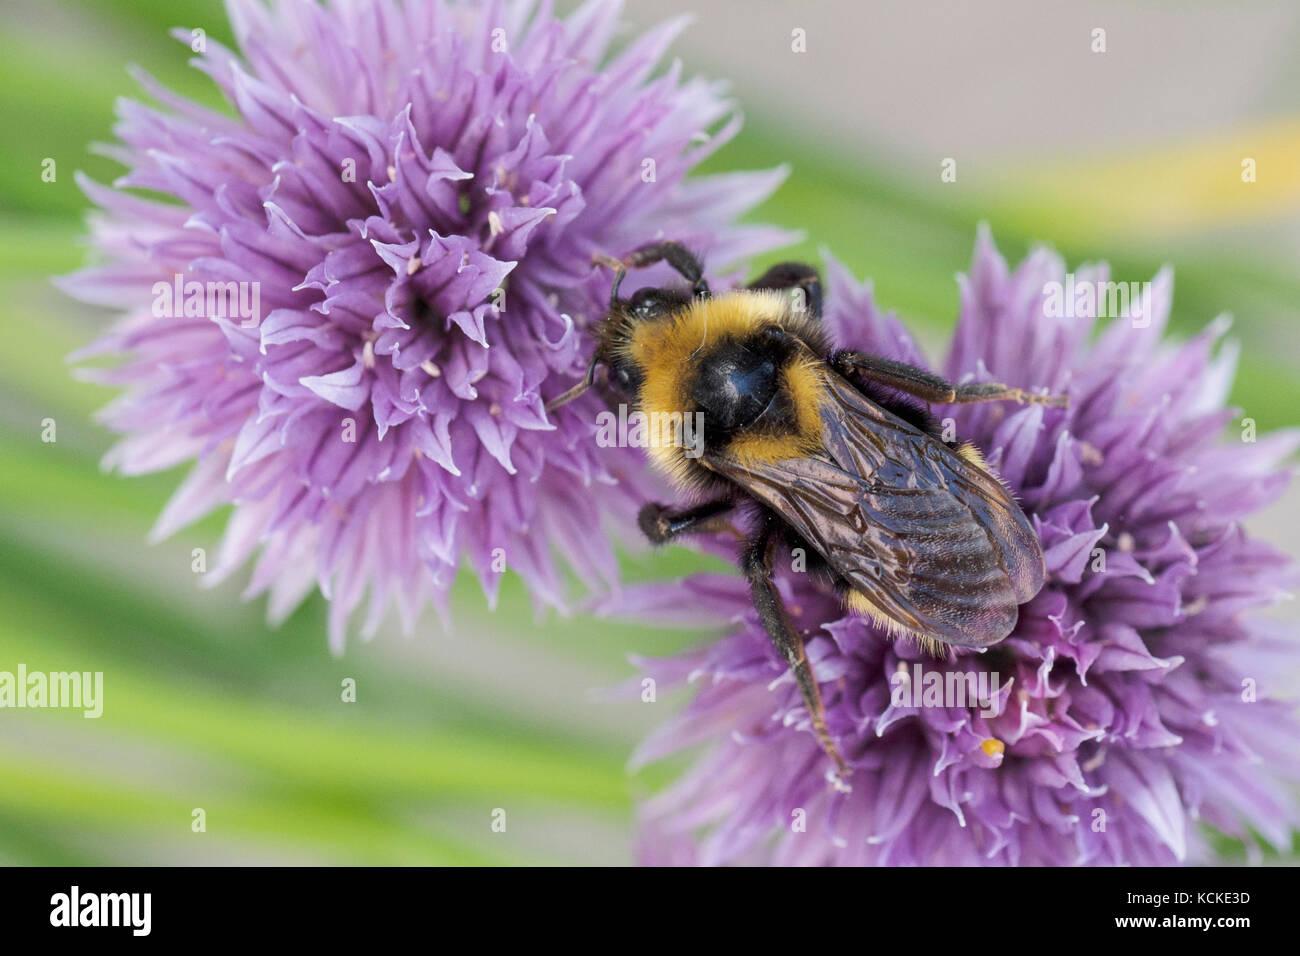 Cuckoo Bumble Bee, Bombus insularis, on chive flowers, Warman, Saskatchewan, Canada Stock Photo